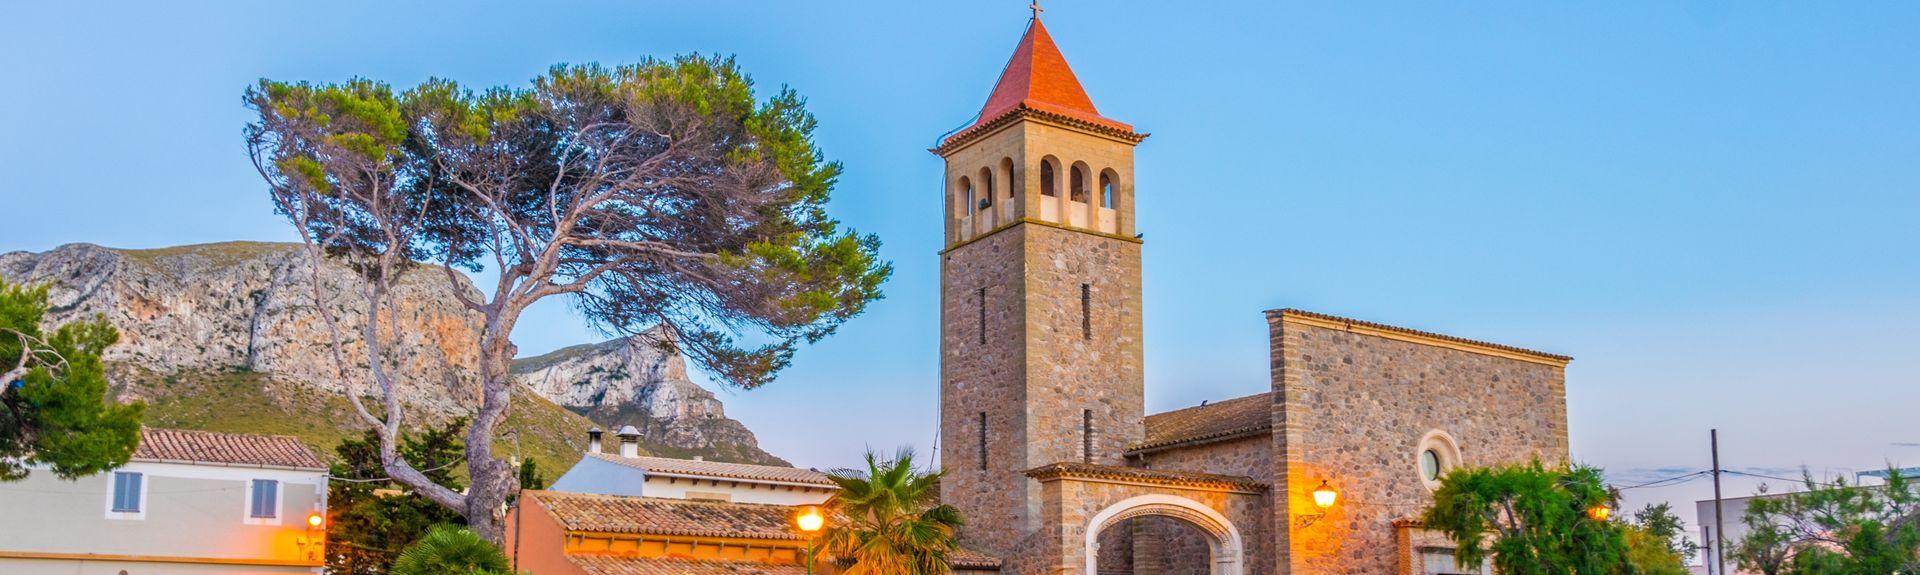 Colonia de Sant Pere, Balearerna, Spanien